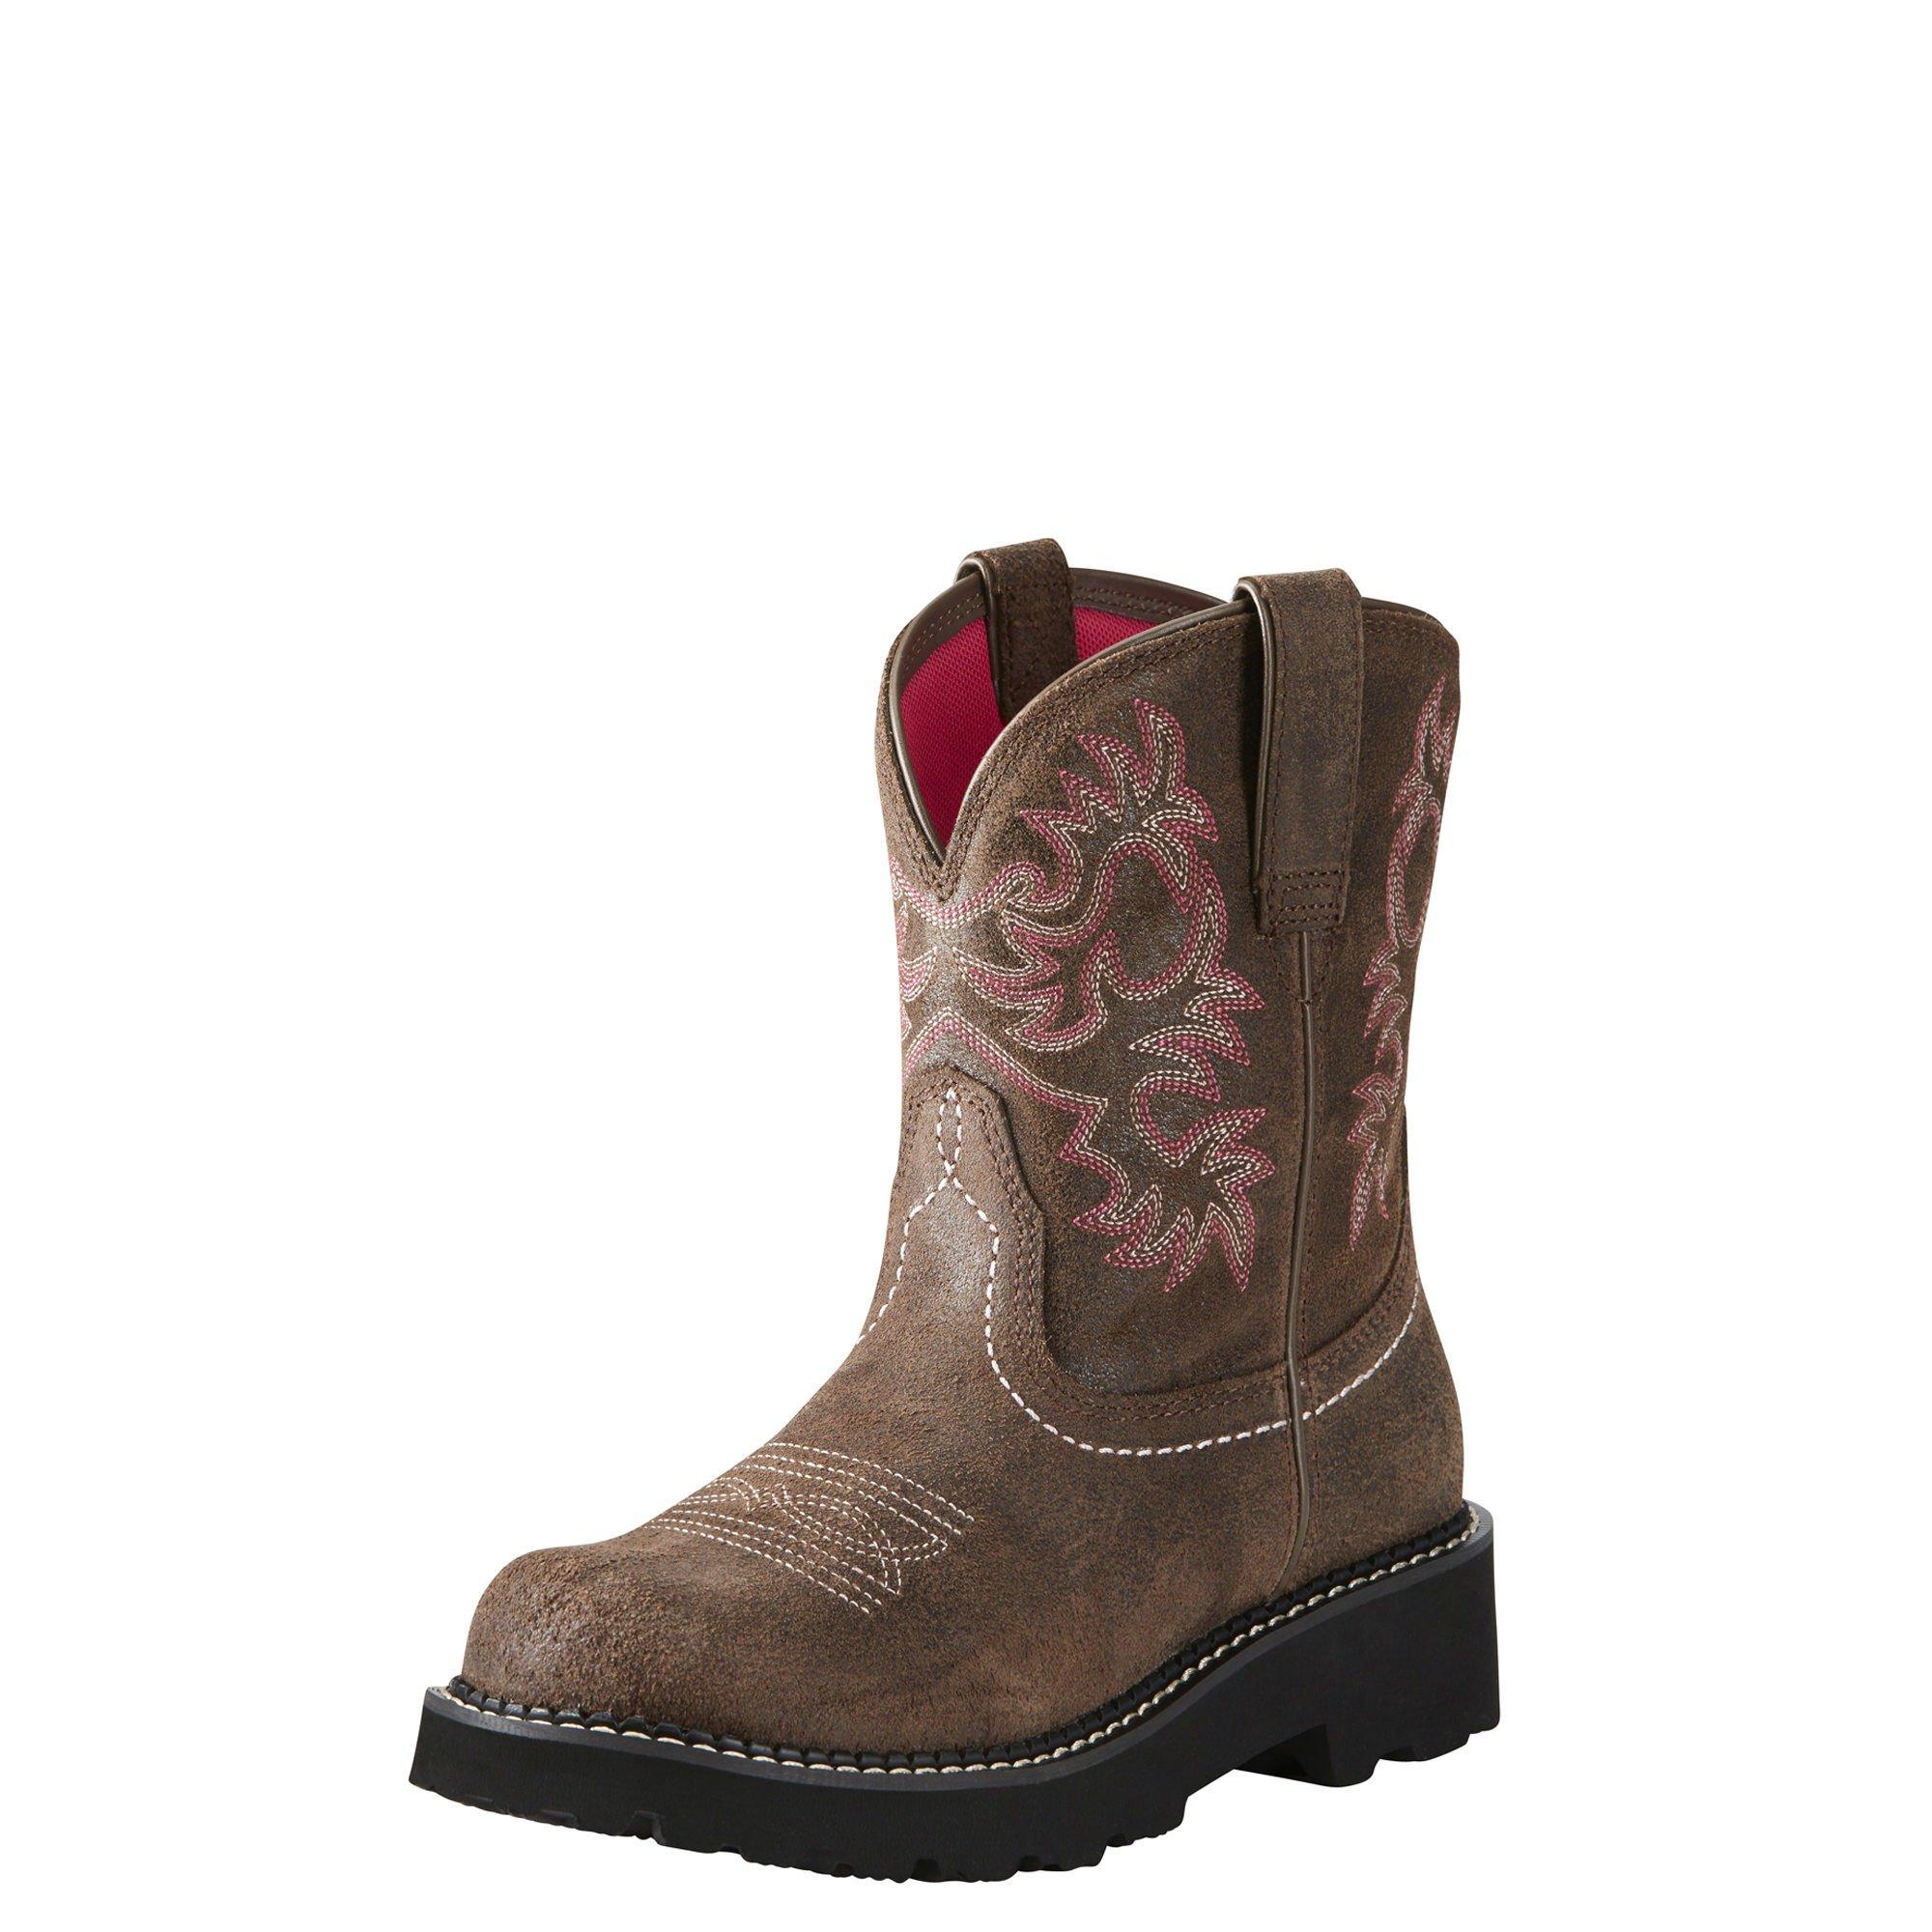 ARIAT WOMEN Fatbaby Collection Western Cowboy Boot, Dark Barley, 6 B US